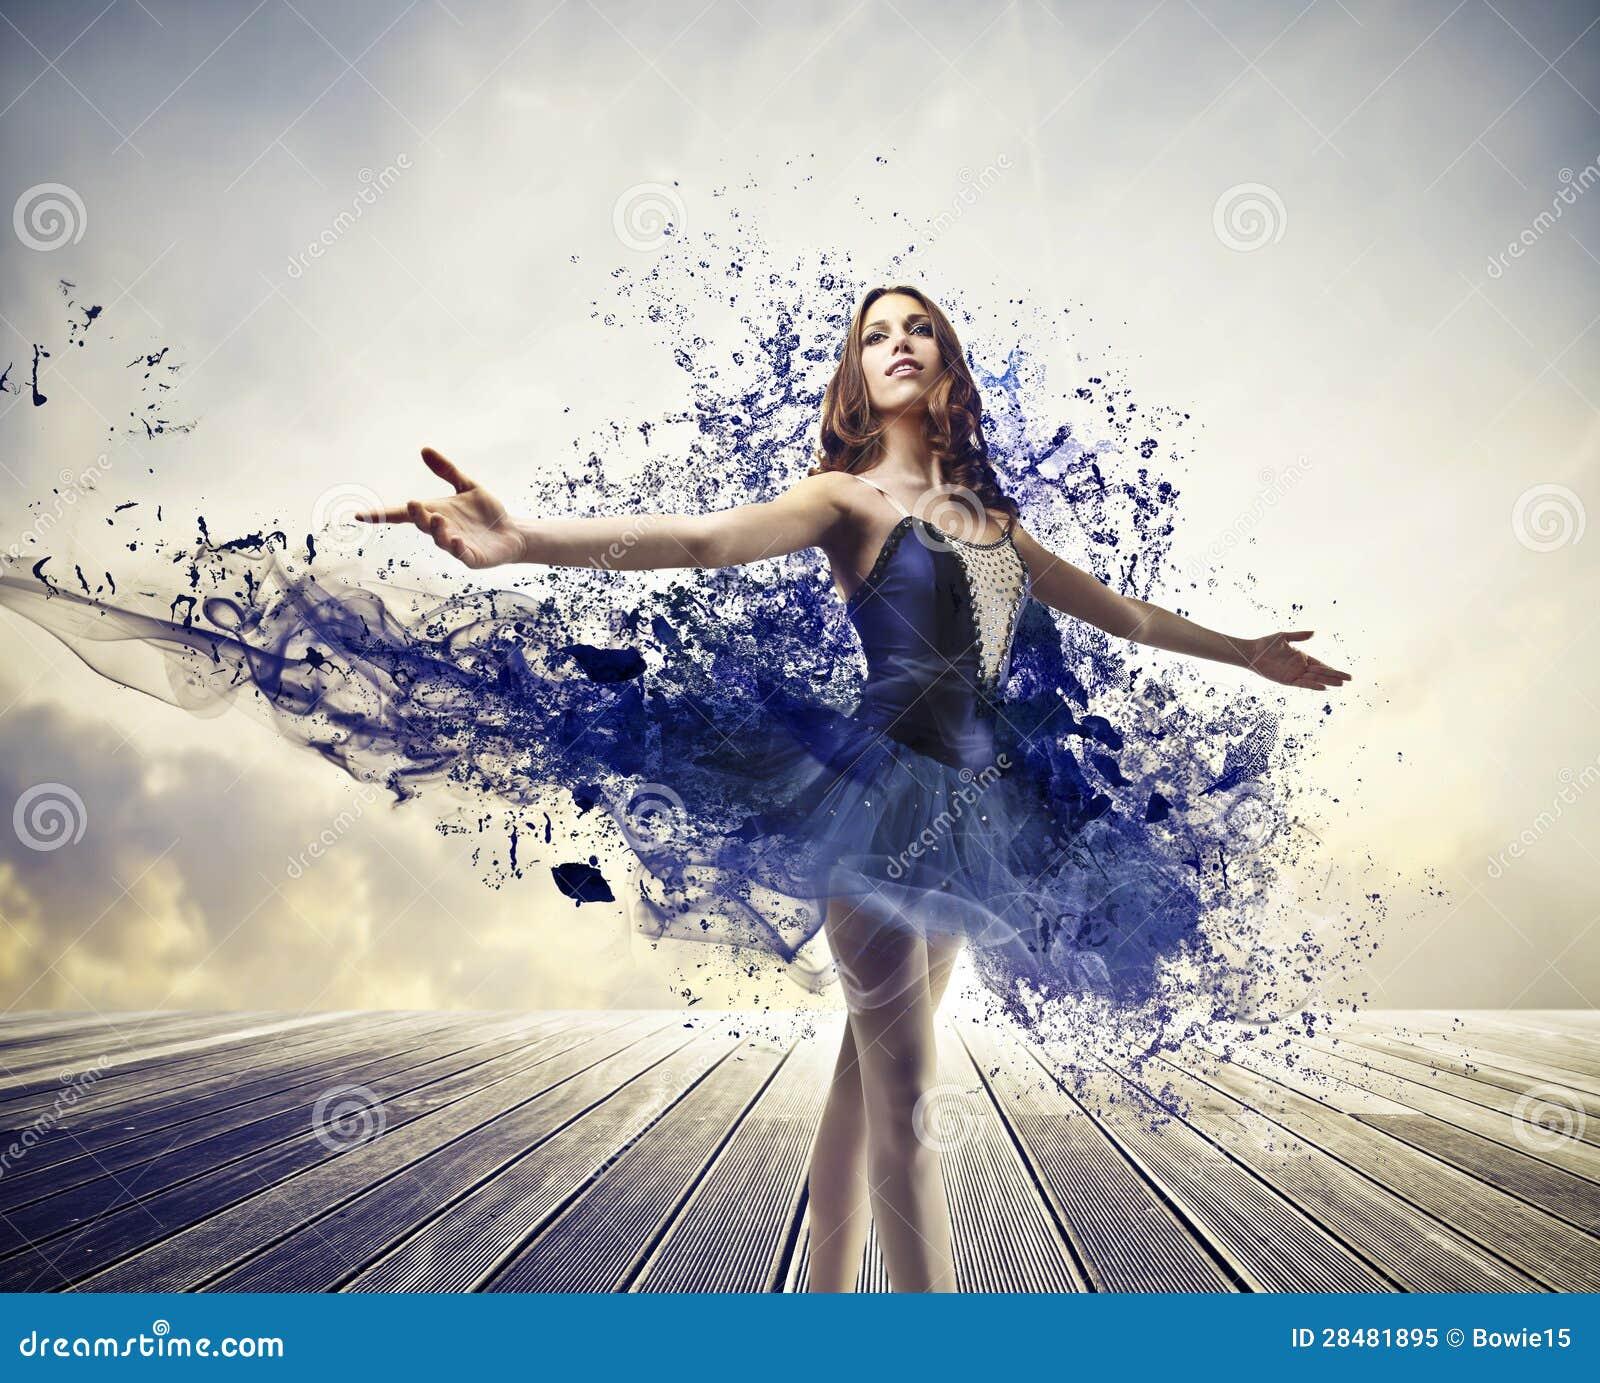 Ballerina Dipinta Blu Fotografia Stock Libera da Diritti - Immagine ...